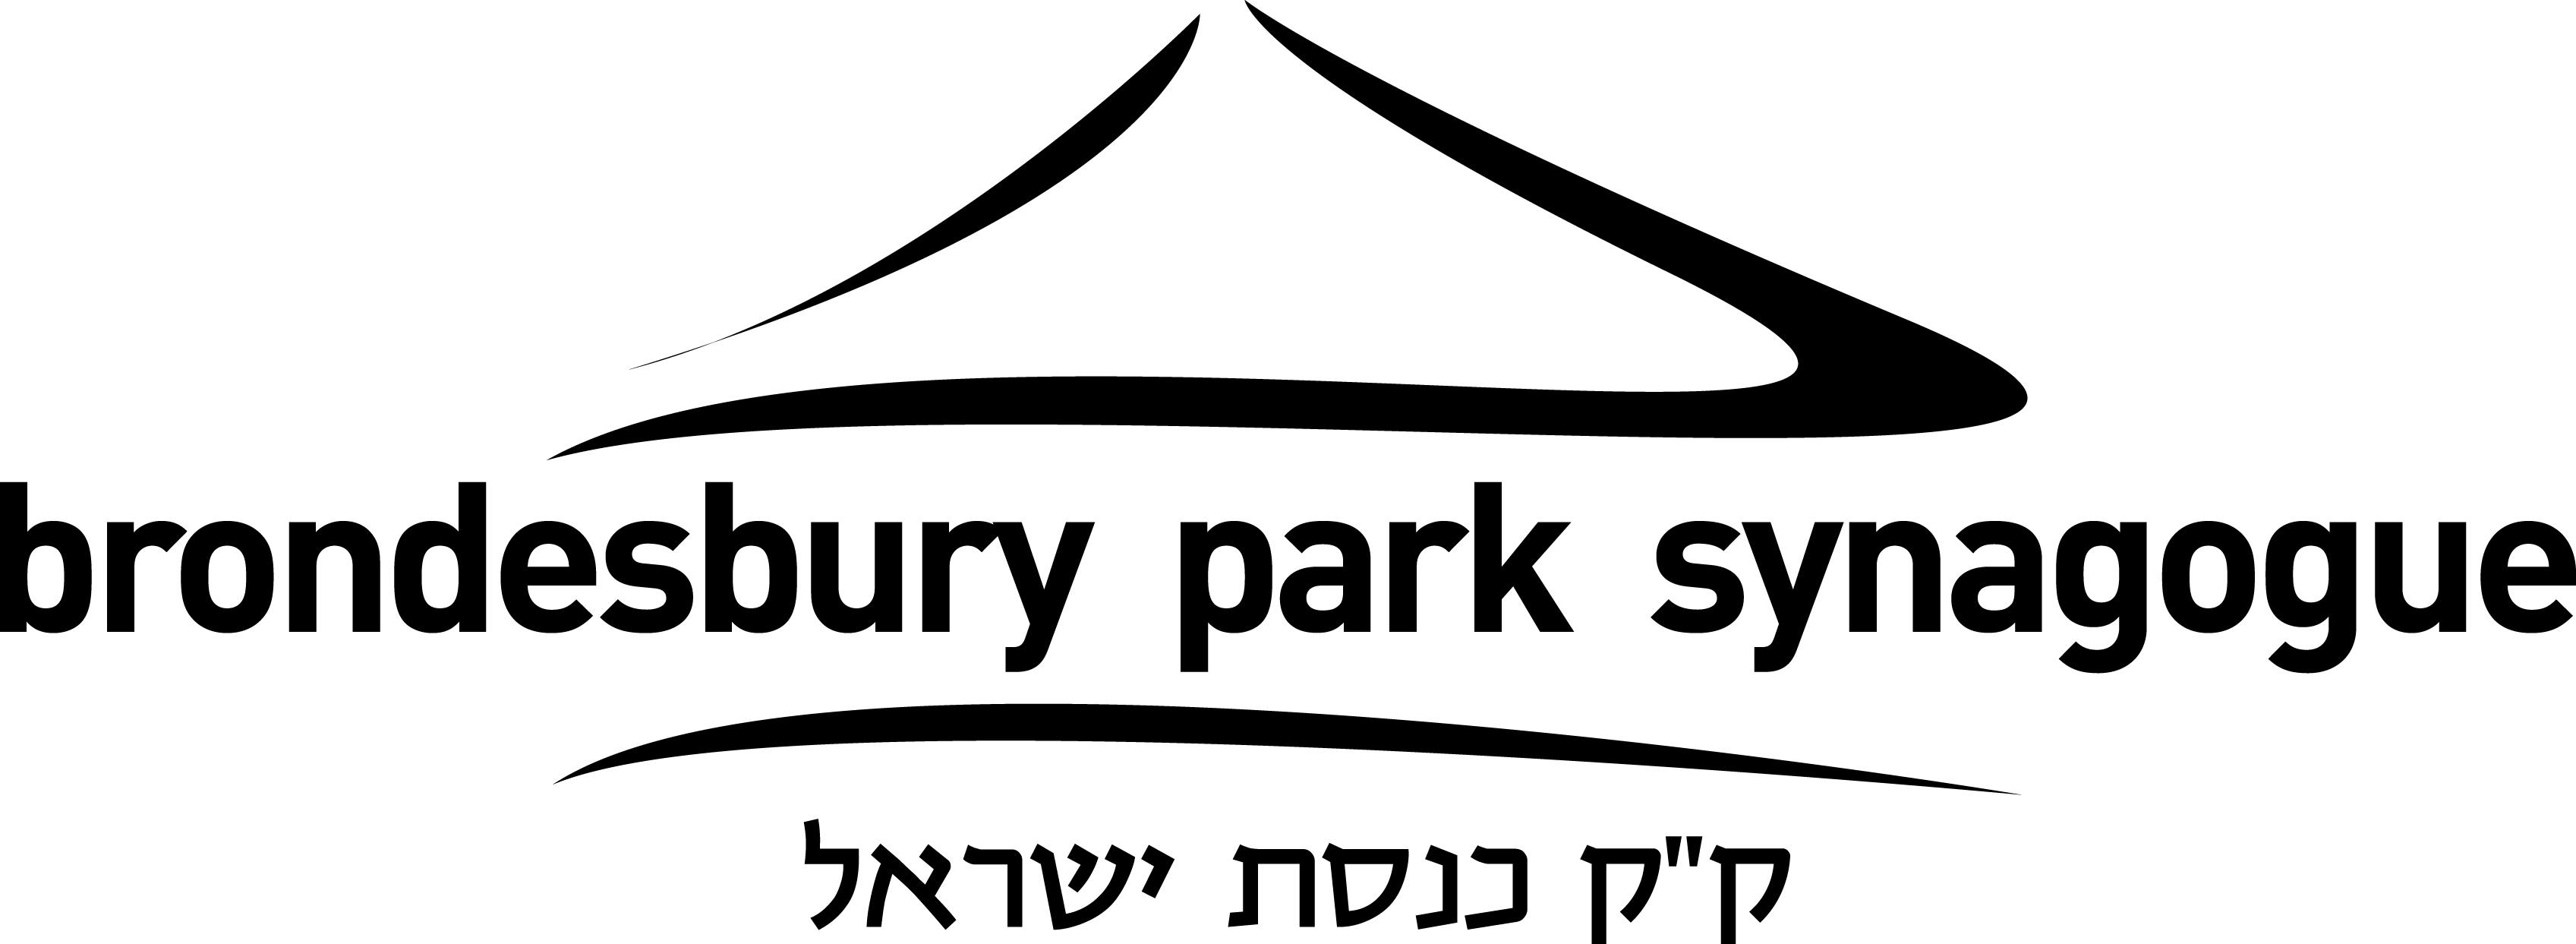 Brondesbury Park Eruv Logo